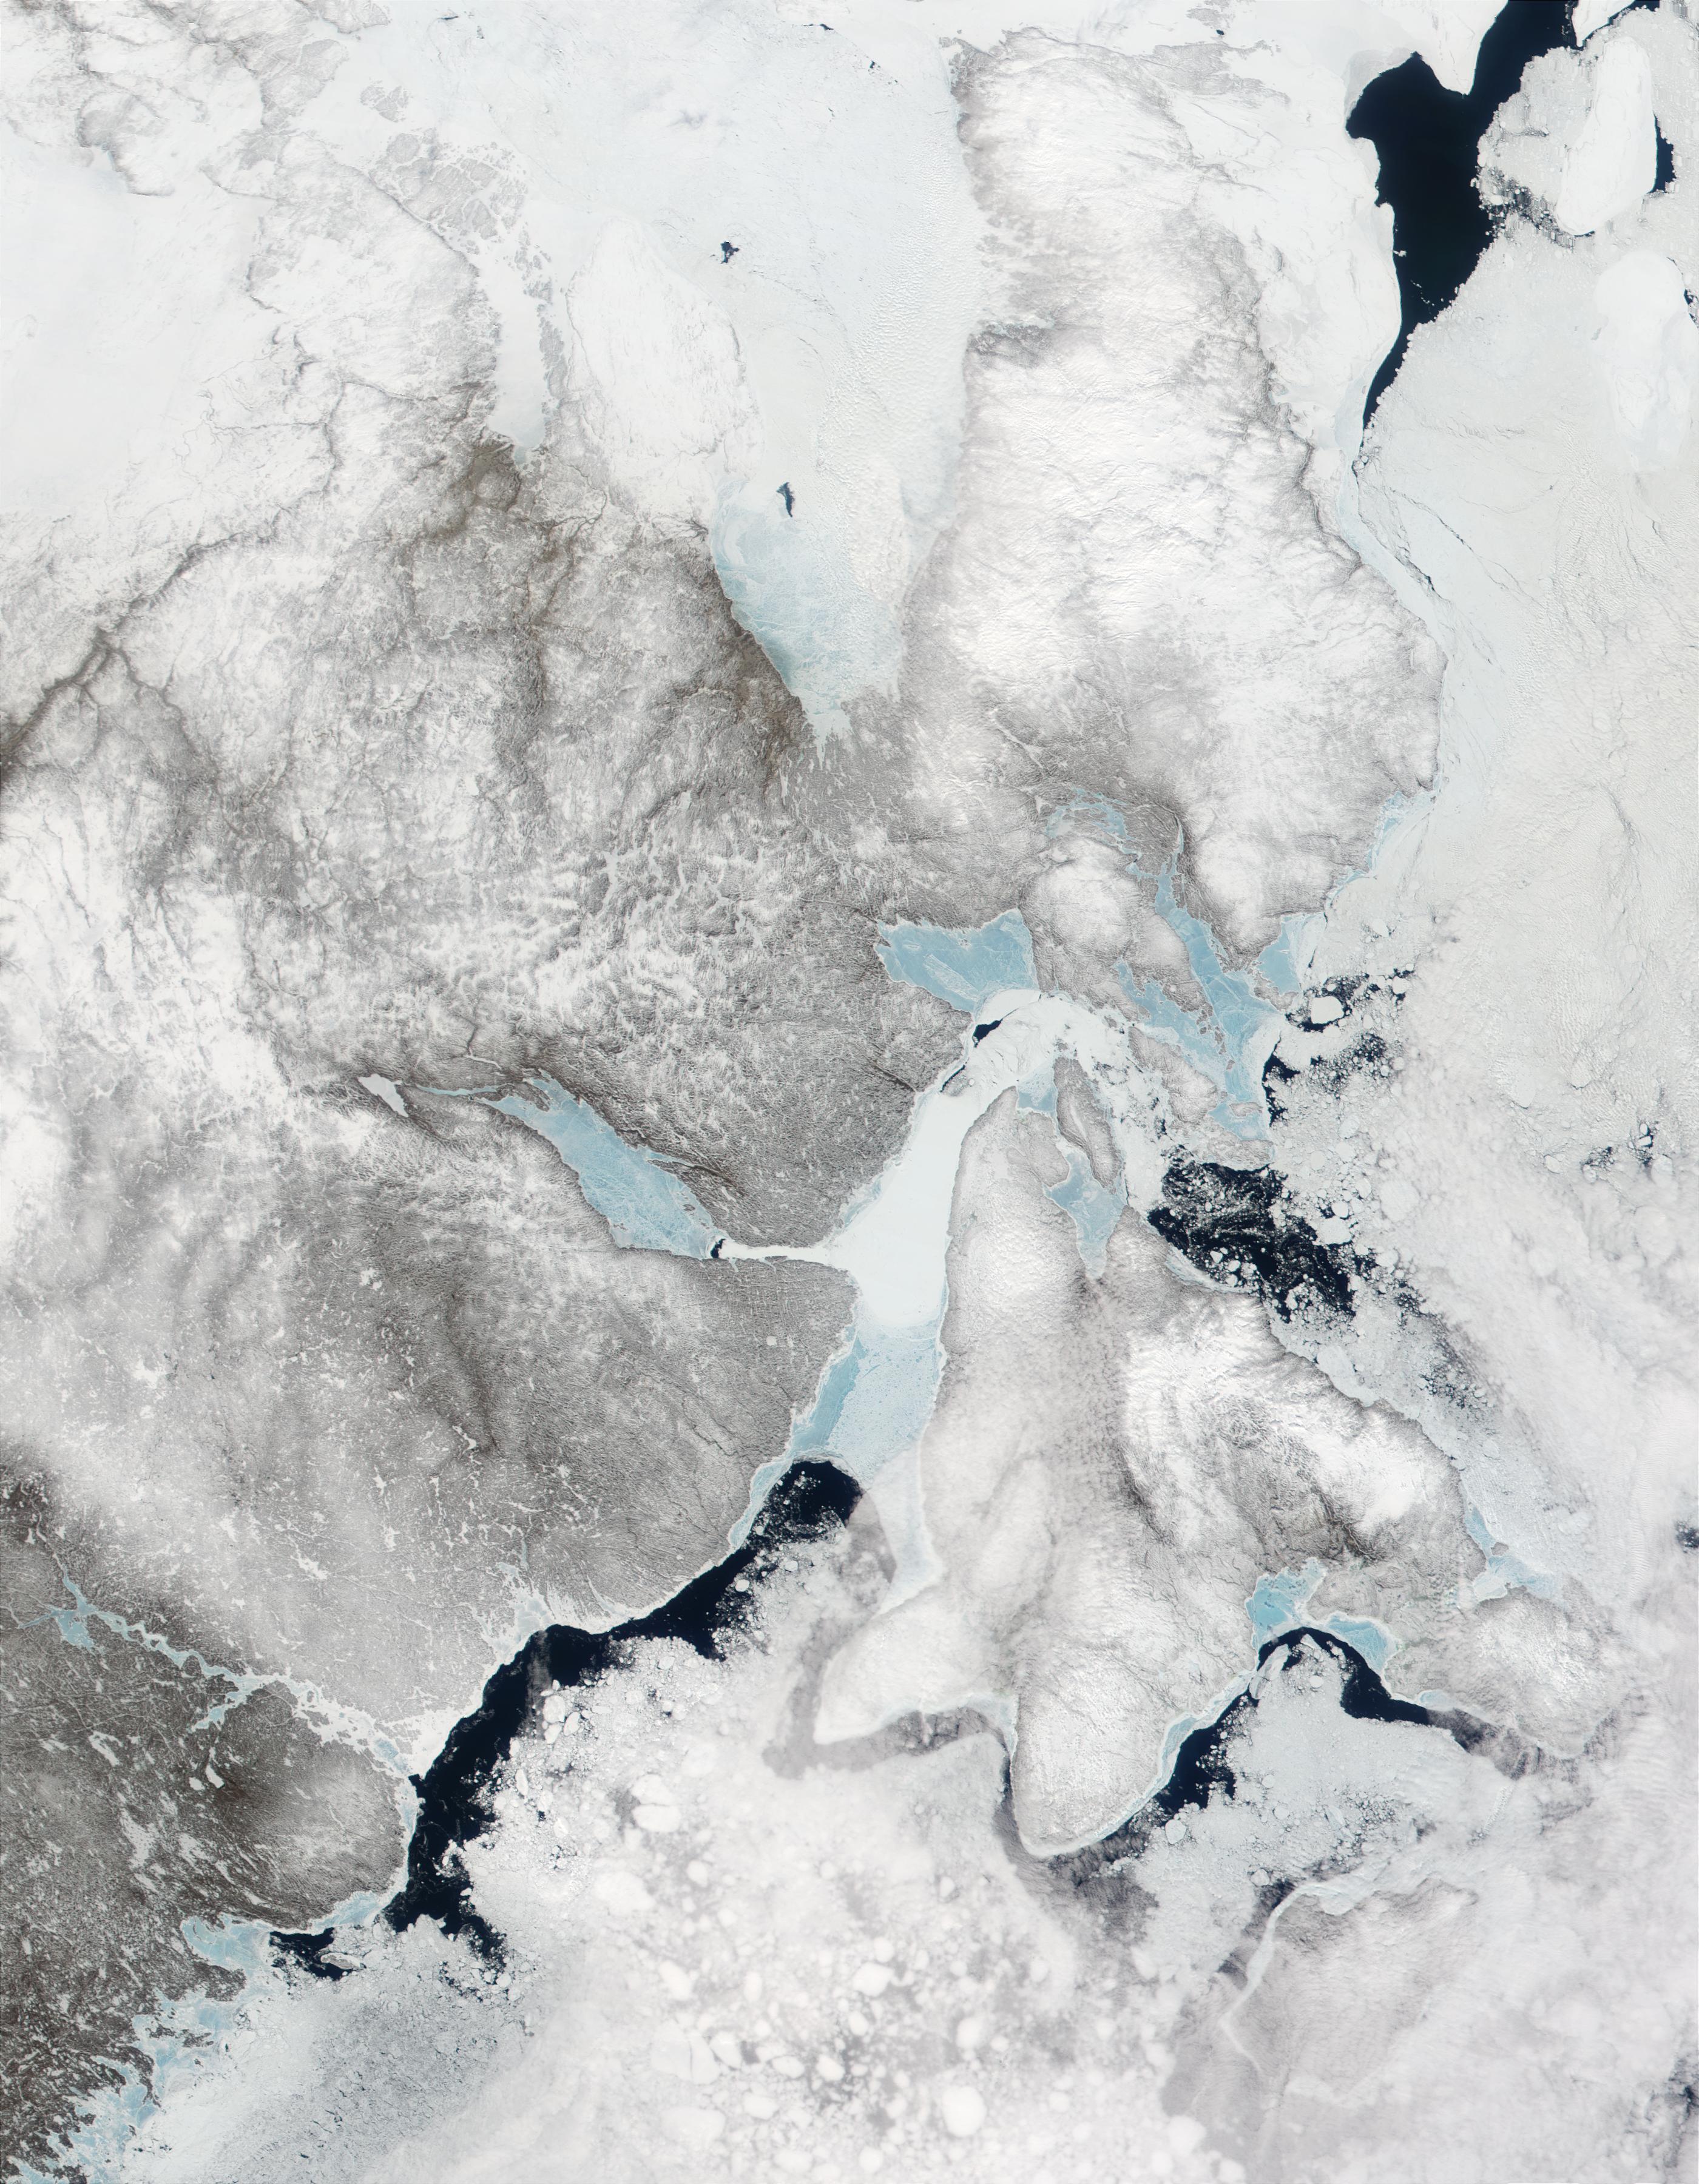 Península de Melville y isla de Southampton, norte de Canadá